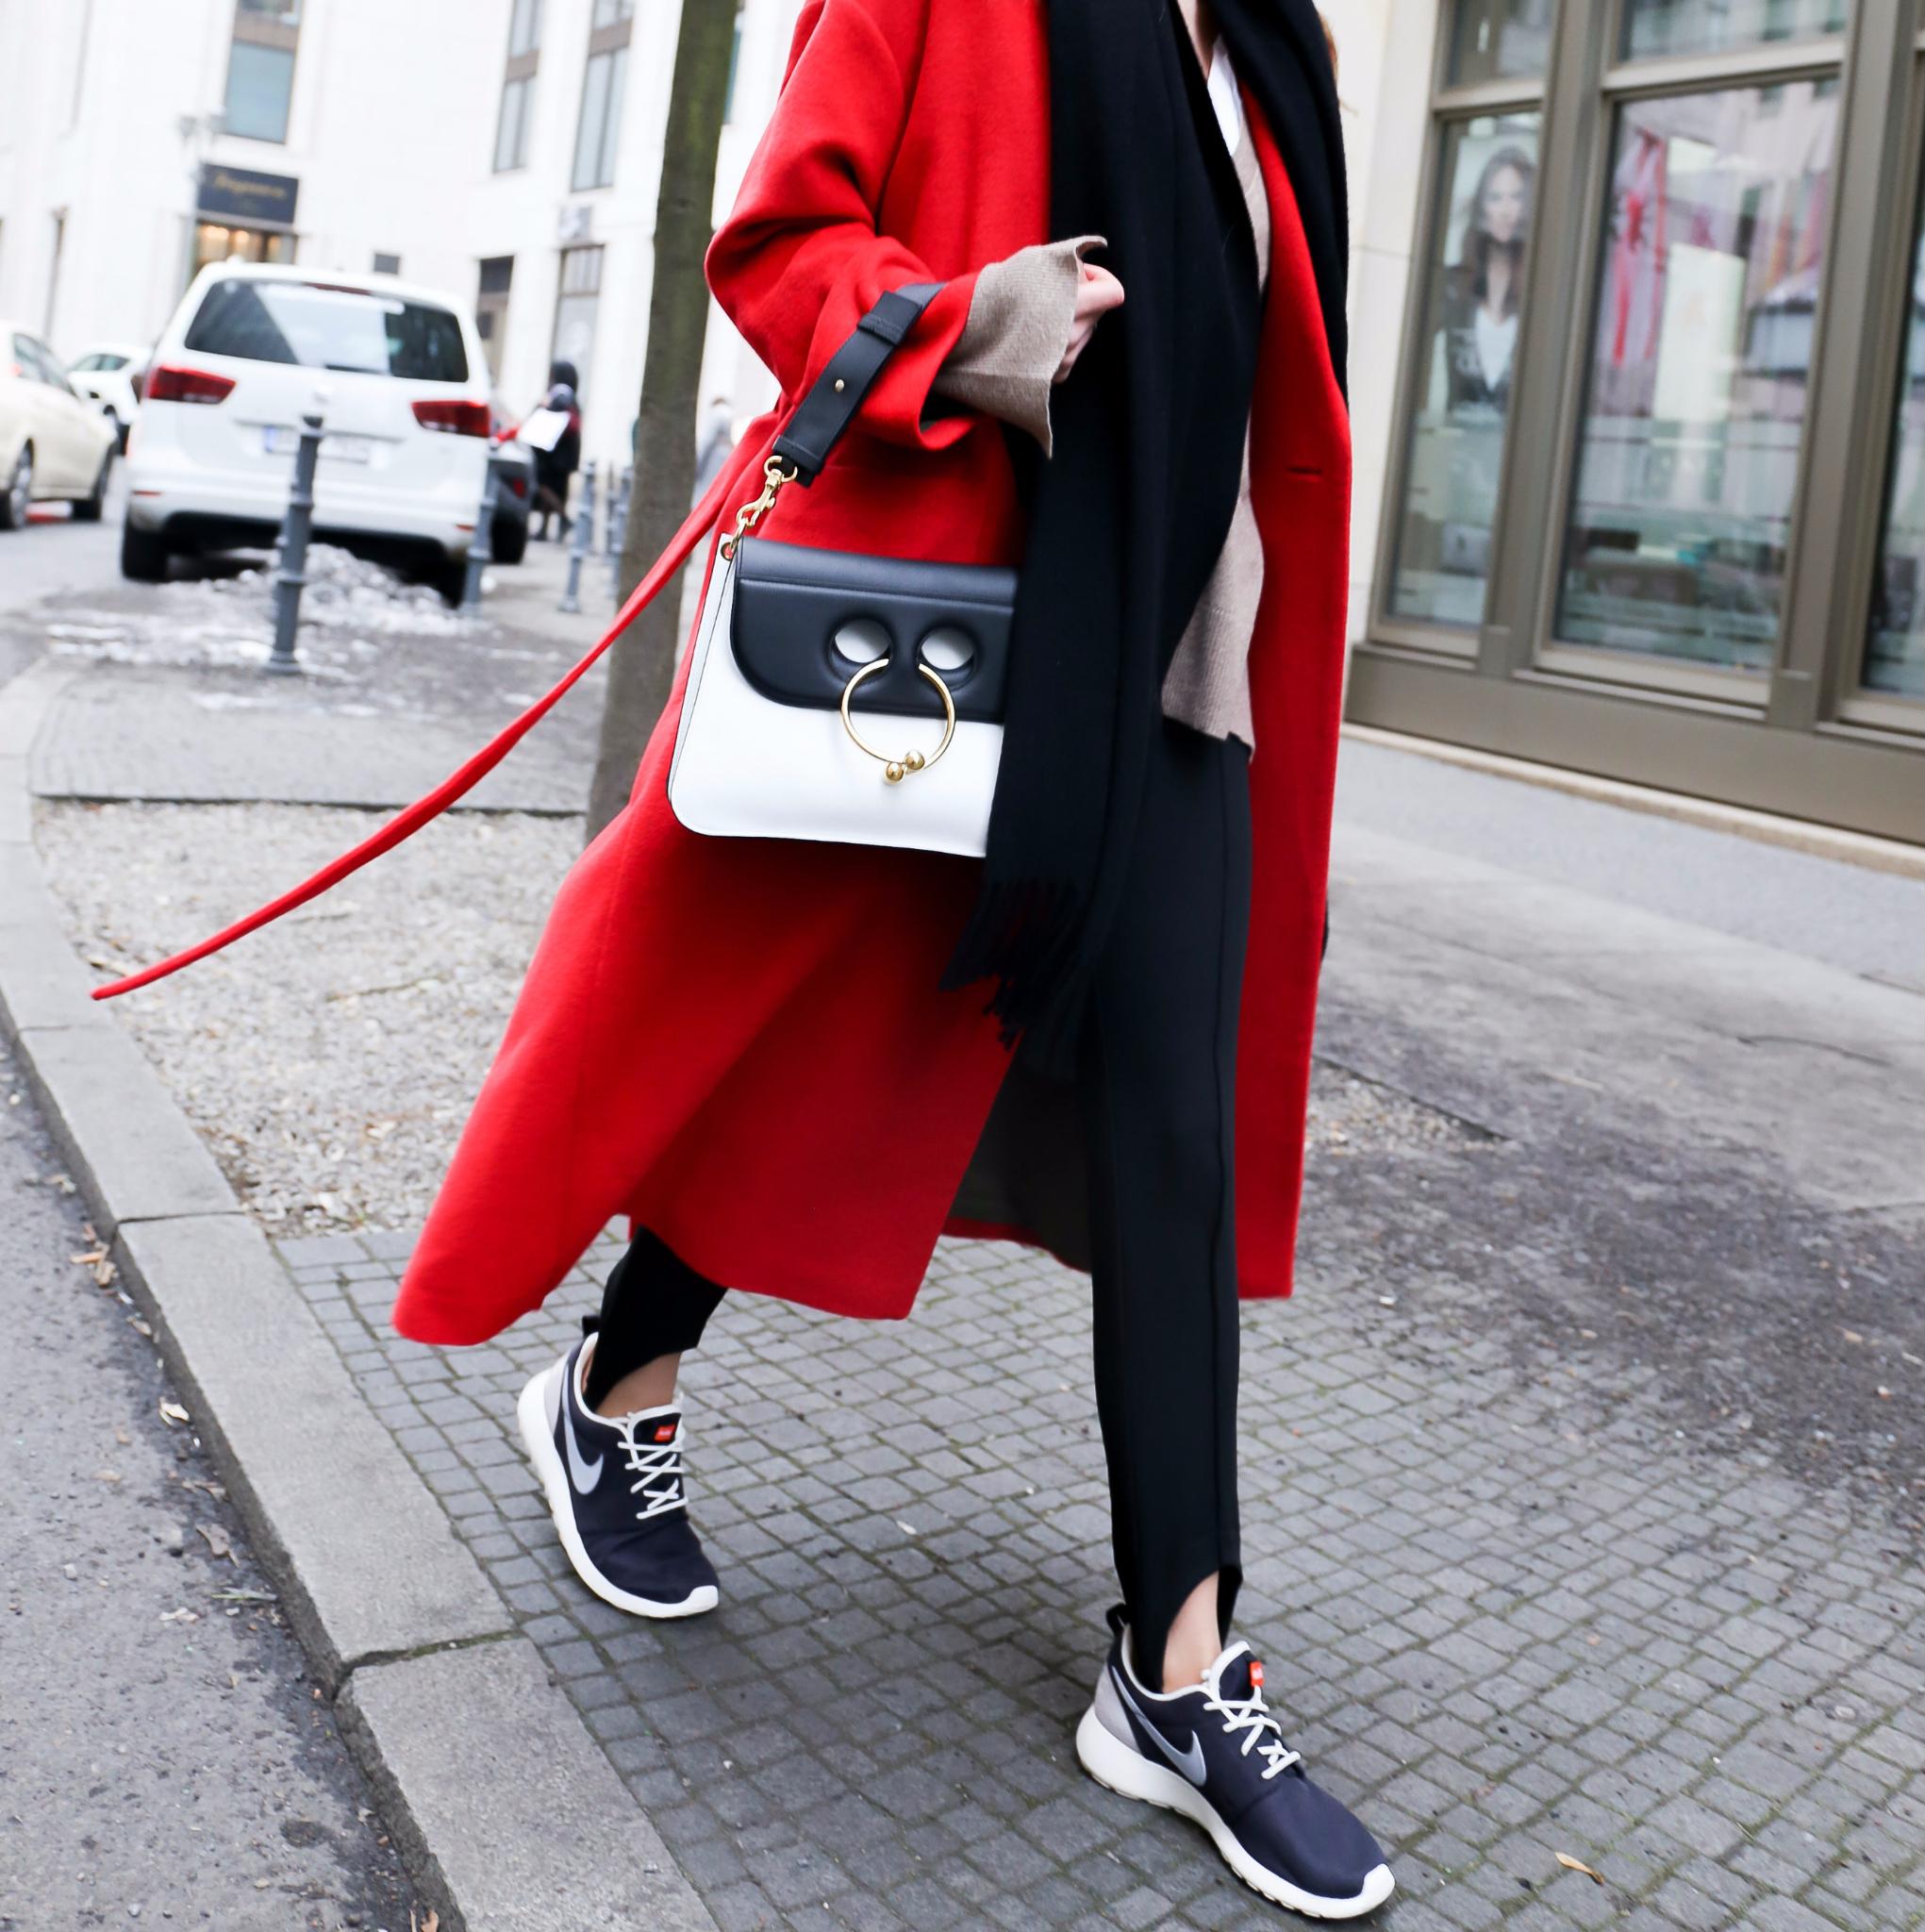 MOD-by-Monique-Fashion-Looks-MBFWB-Look-#2-12-1